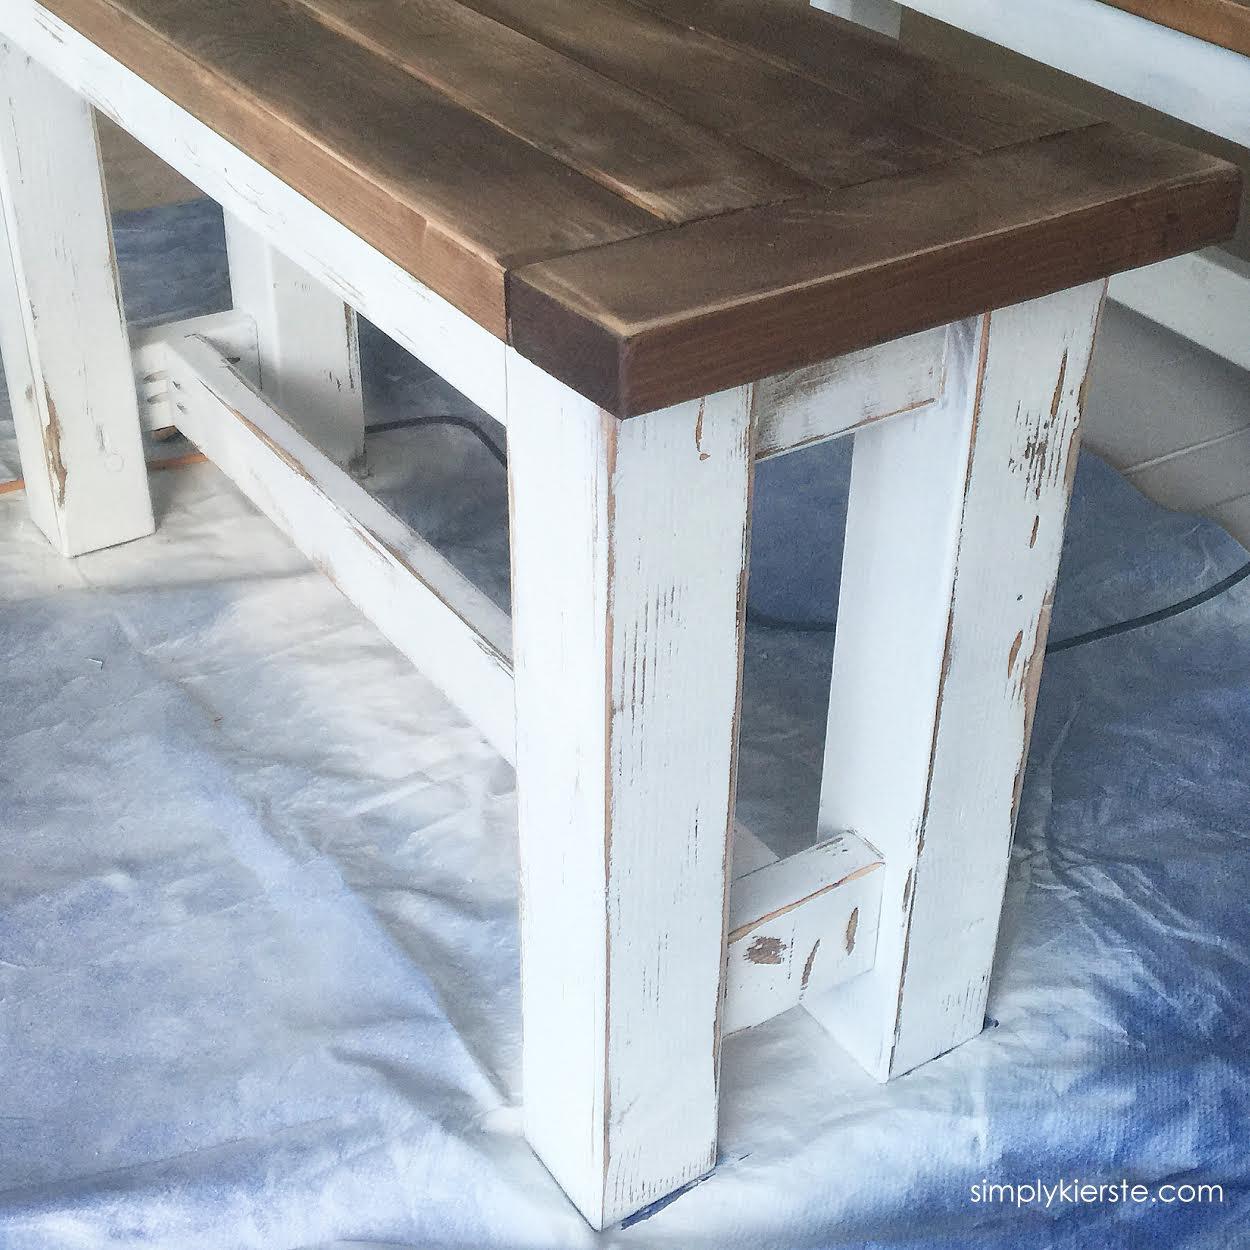 Magnificent Diy Kitchen Benches Budget Kitchen Ideas Farmhouse Style Beatyapartments Chair Design Images Beatyapartmentscom